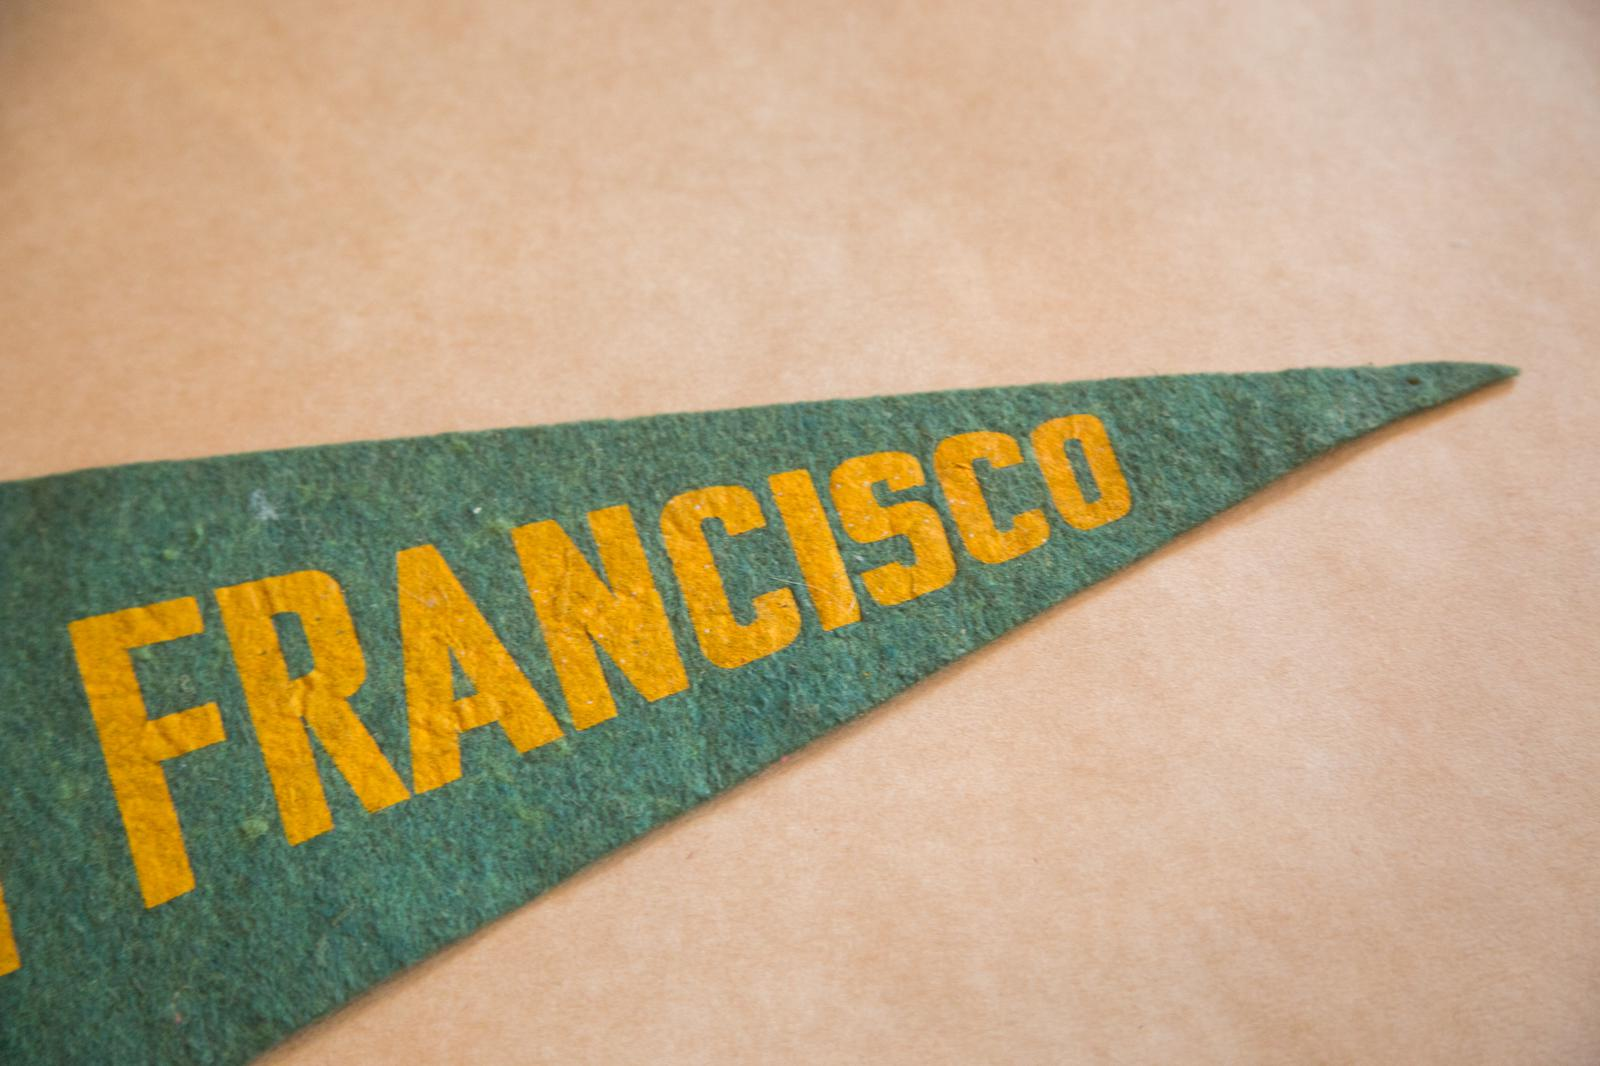 1940s San Francisco CA Felt Flag   Image 2 Of 4